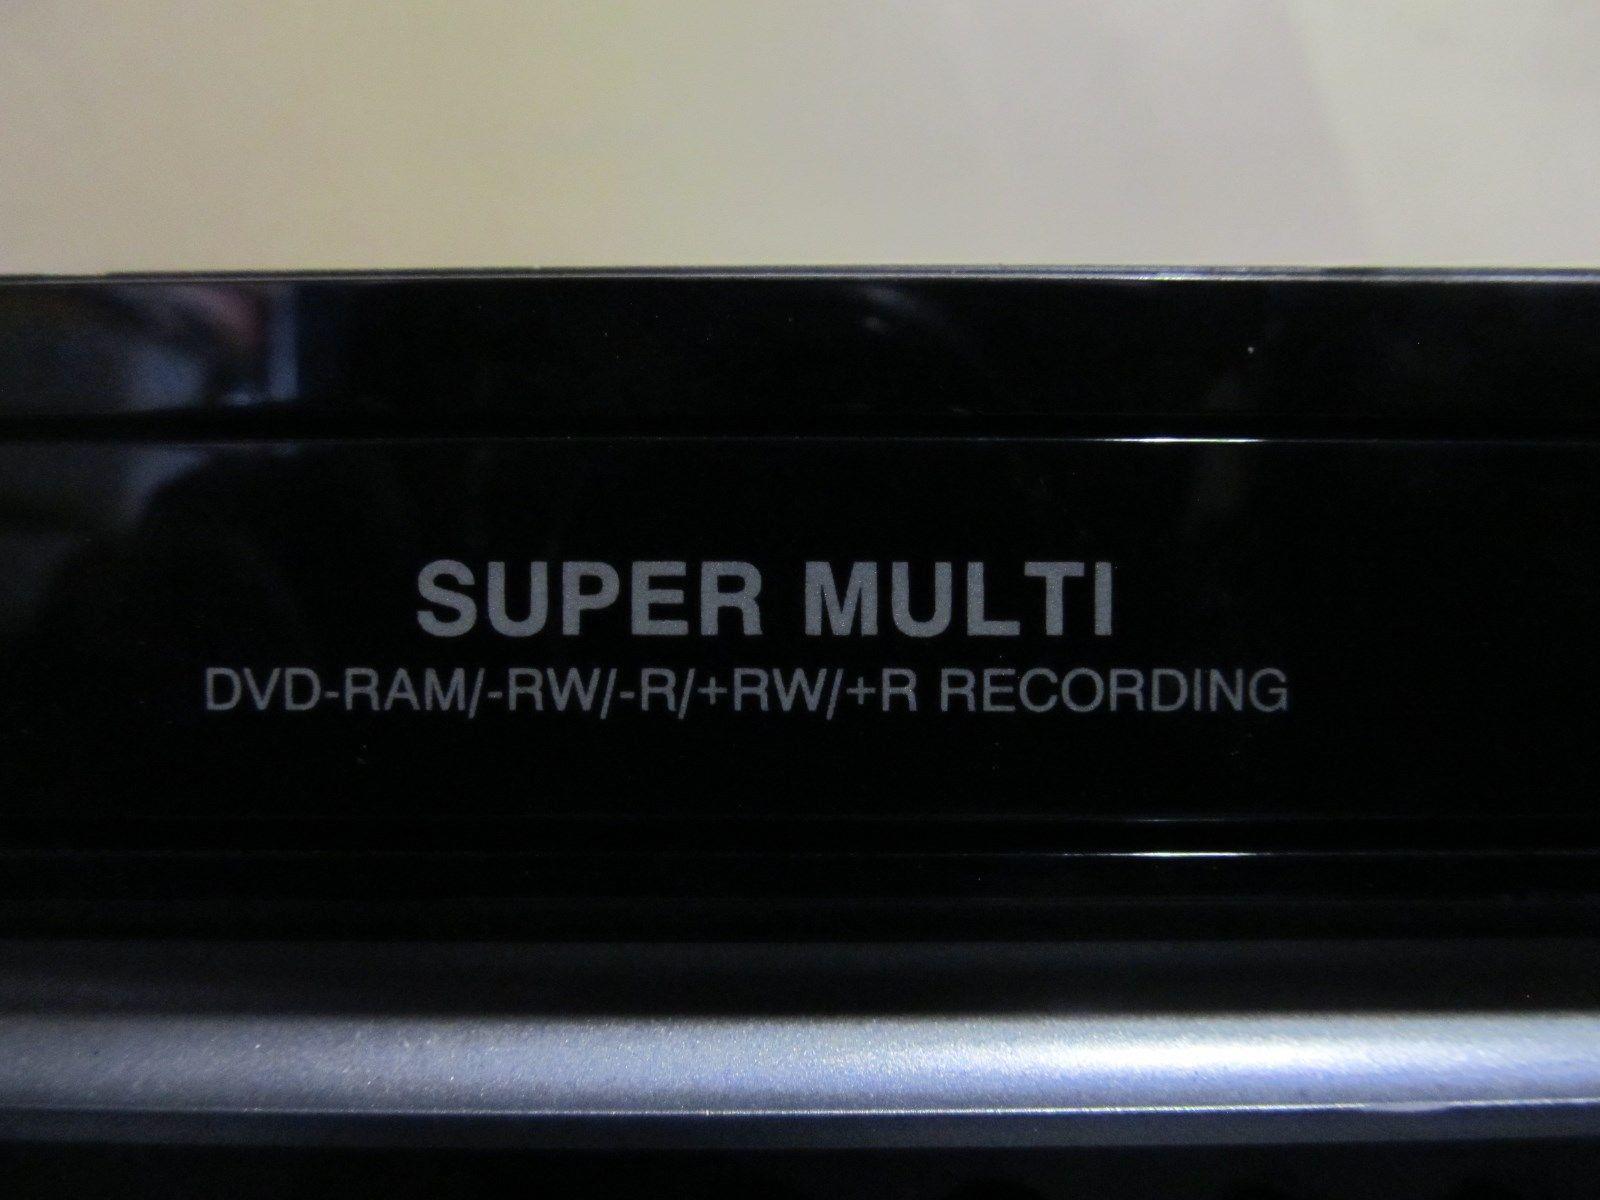 OEM LG DVD recorder/VCR model RC797T